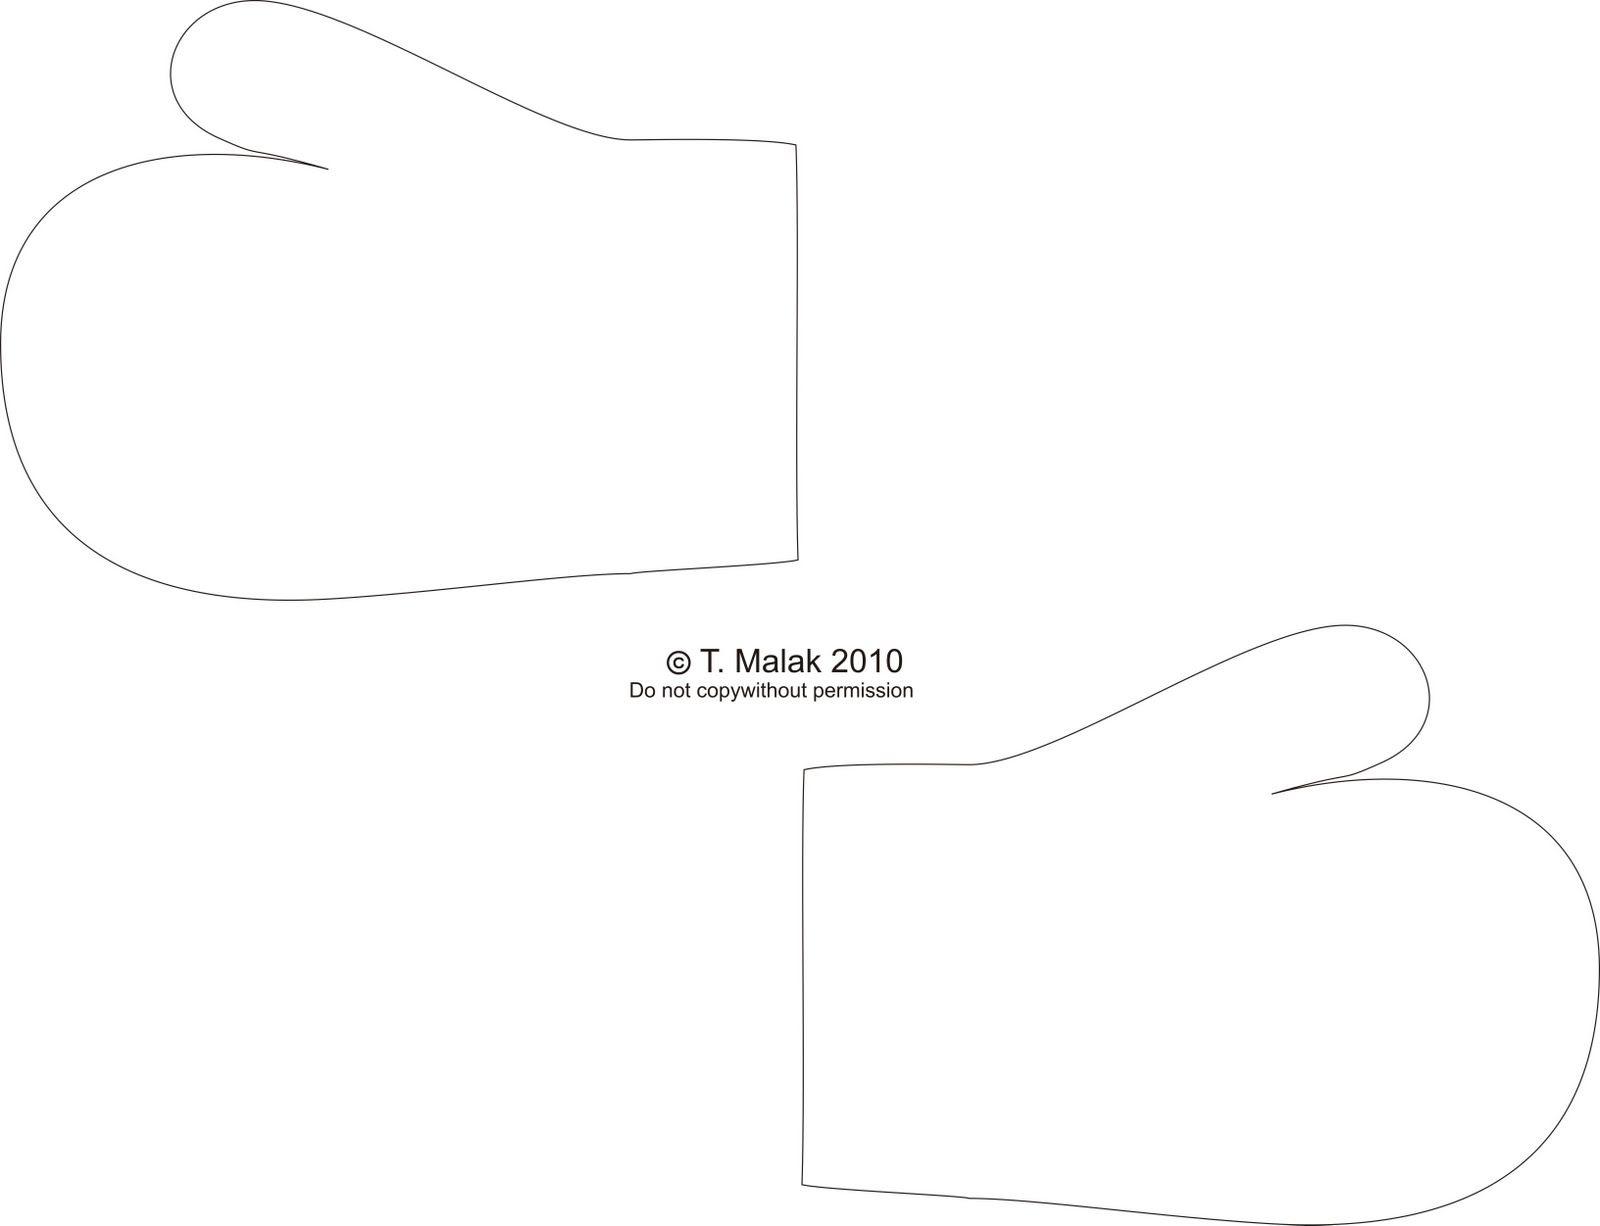 single mitten template - Google Search   Crafts   Pinterest ...